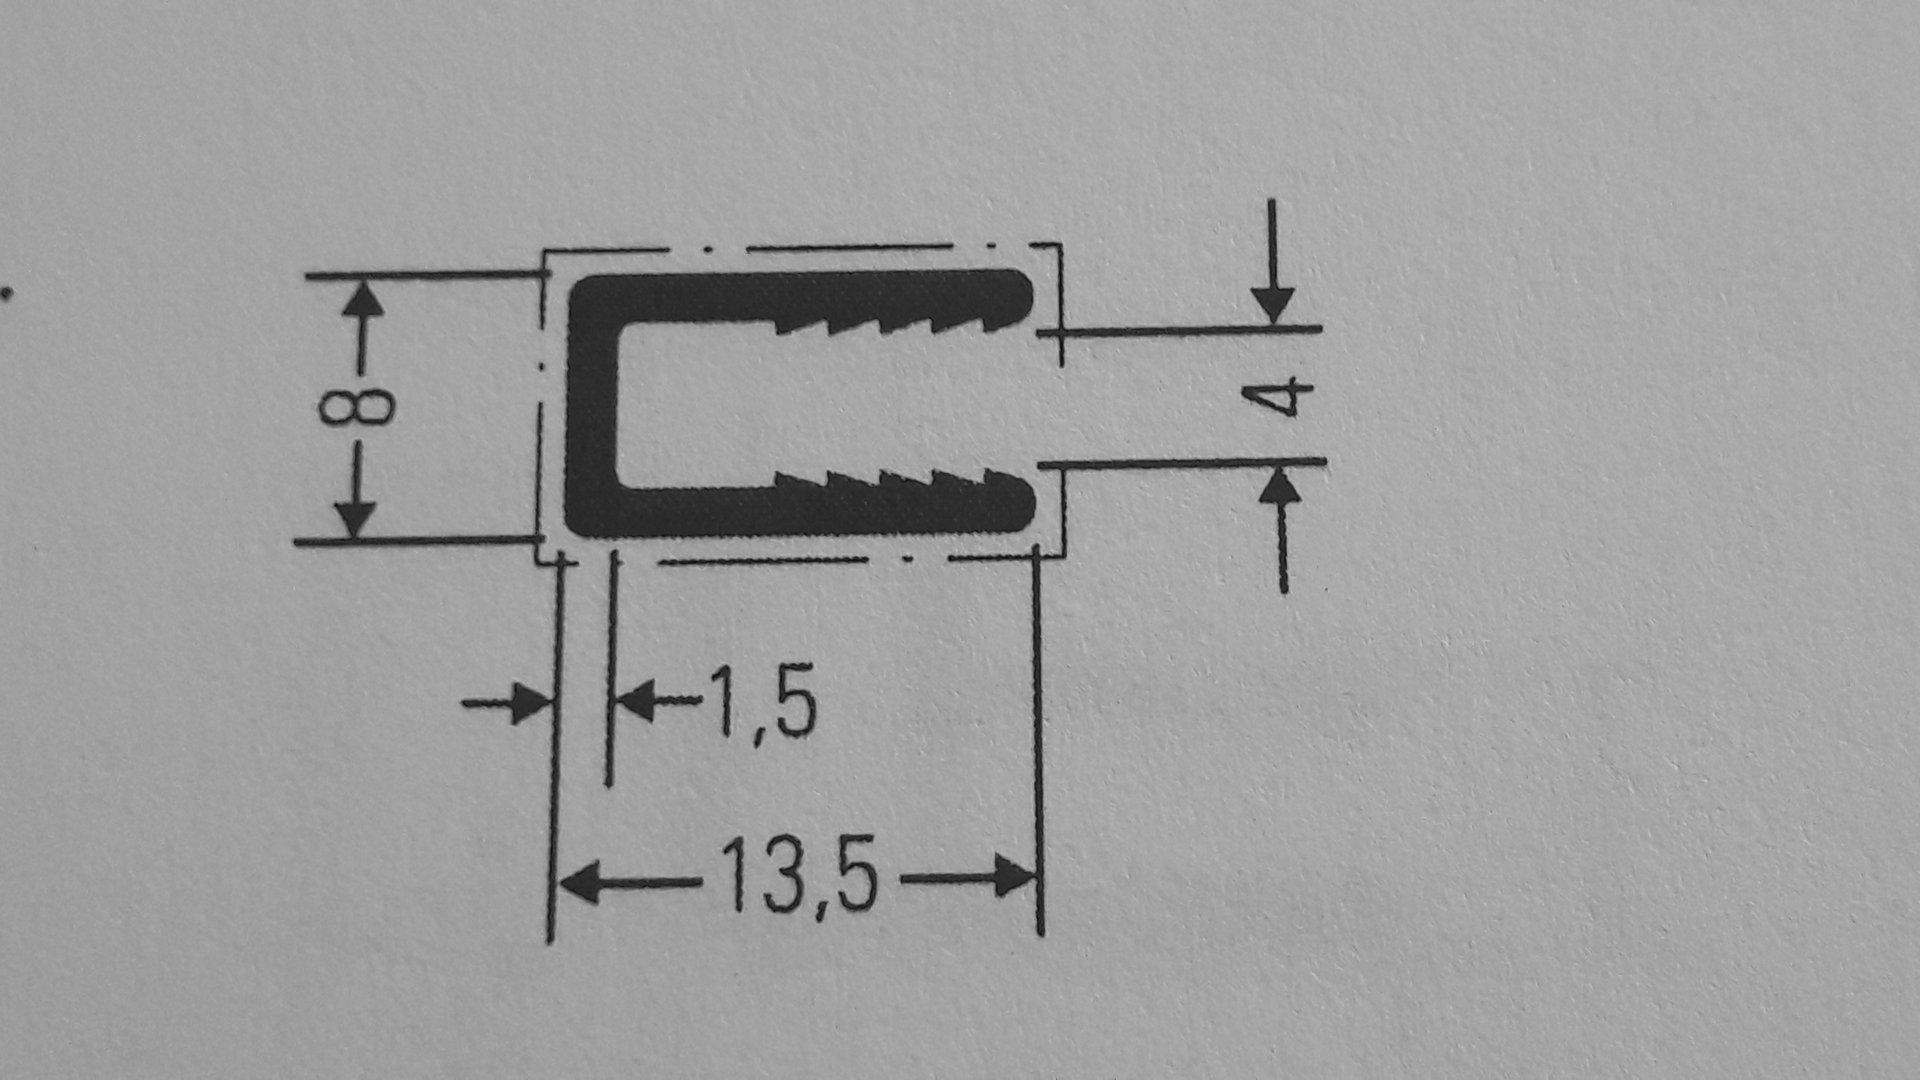 Fabulous Aluminium U - Profil für 4 mm Platten - hbholzmaus-Kunststoffe CG88